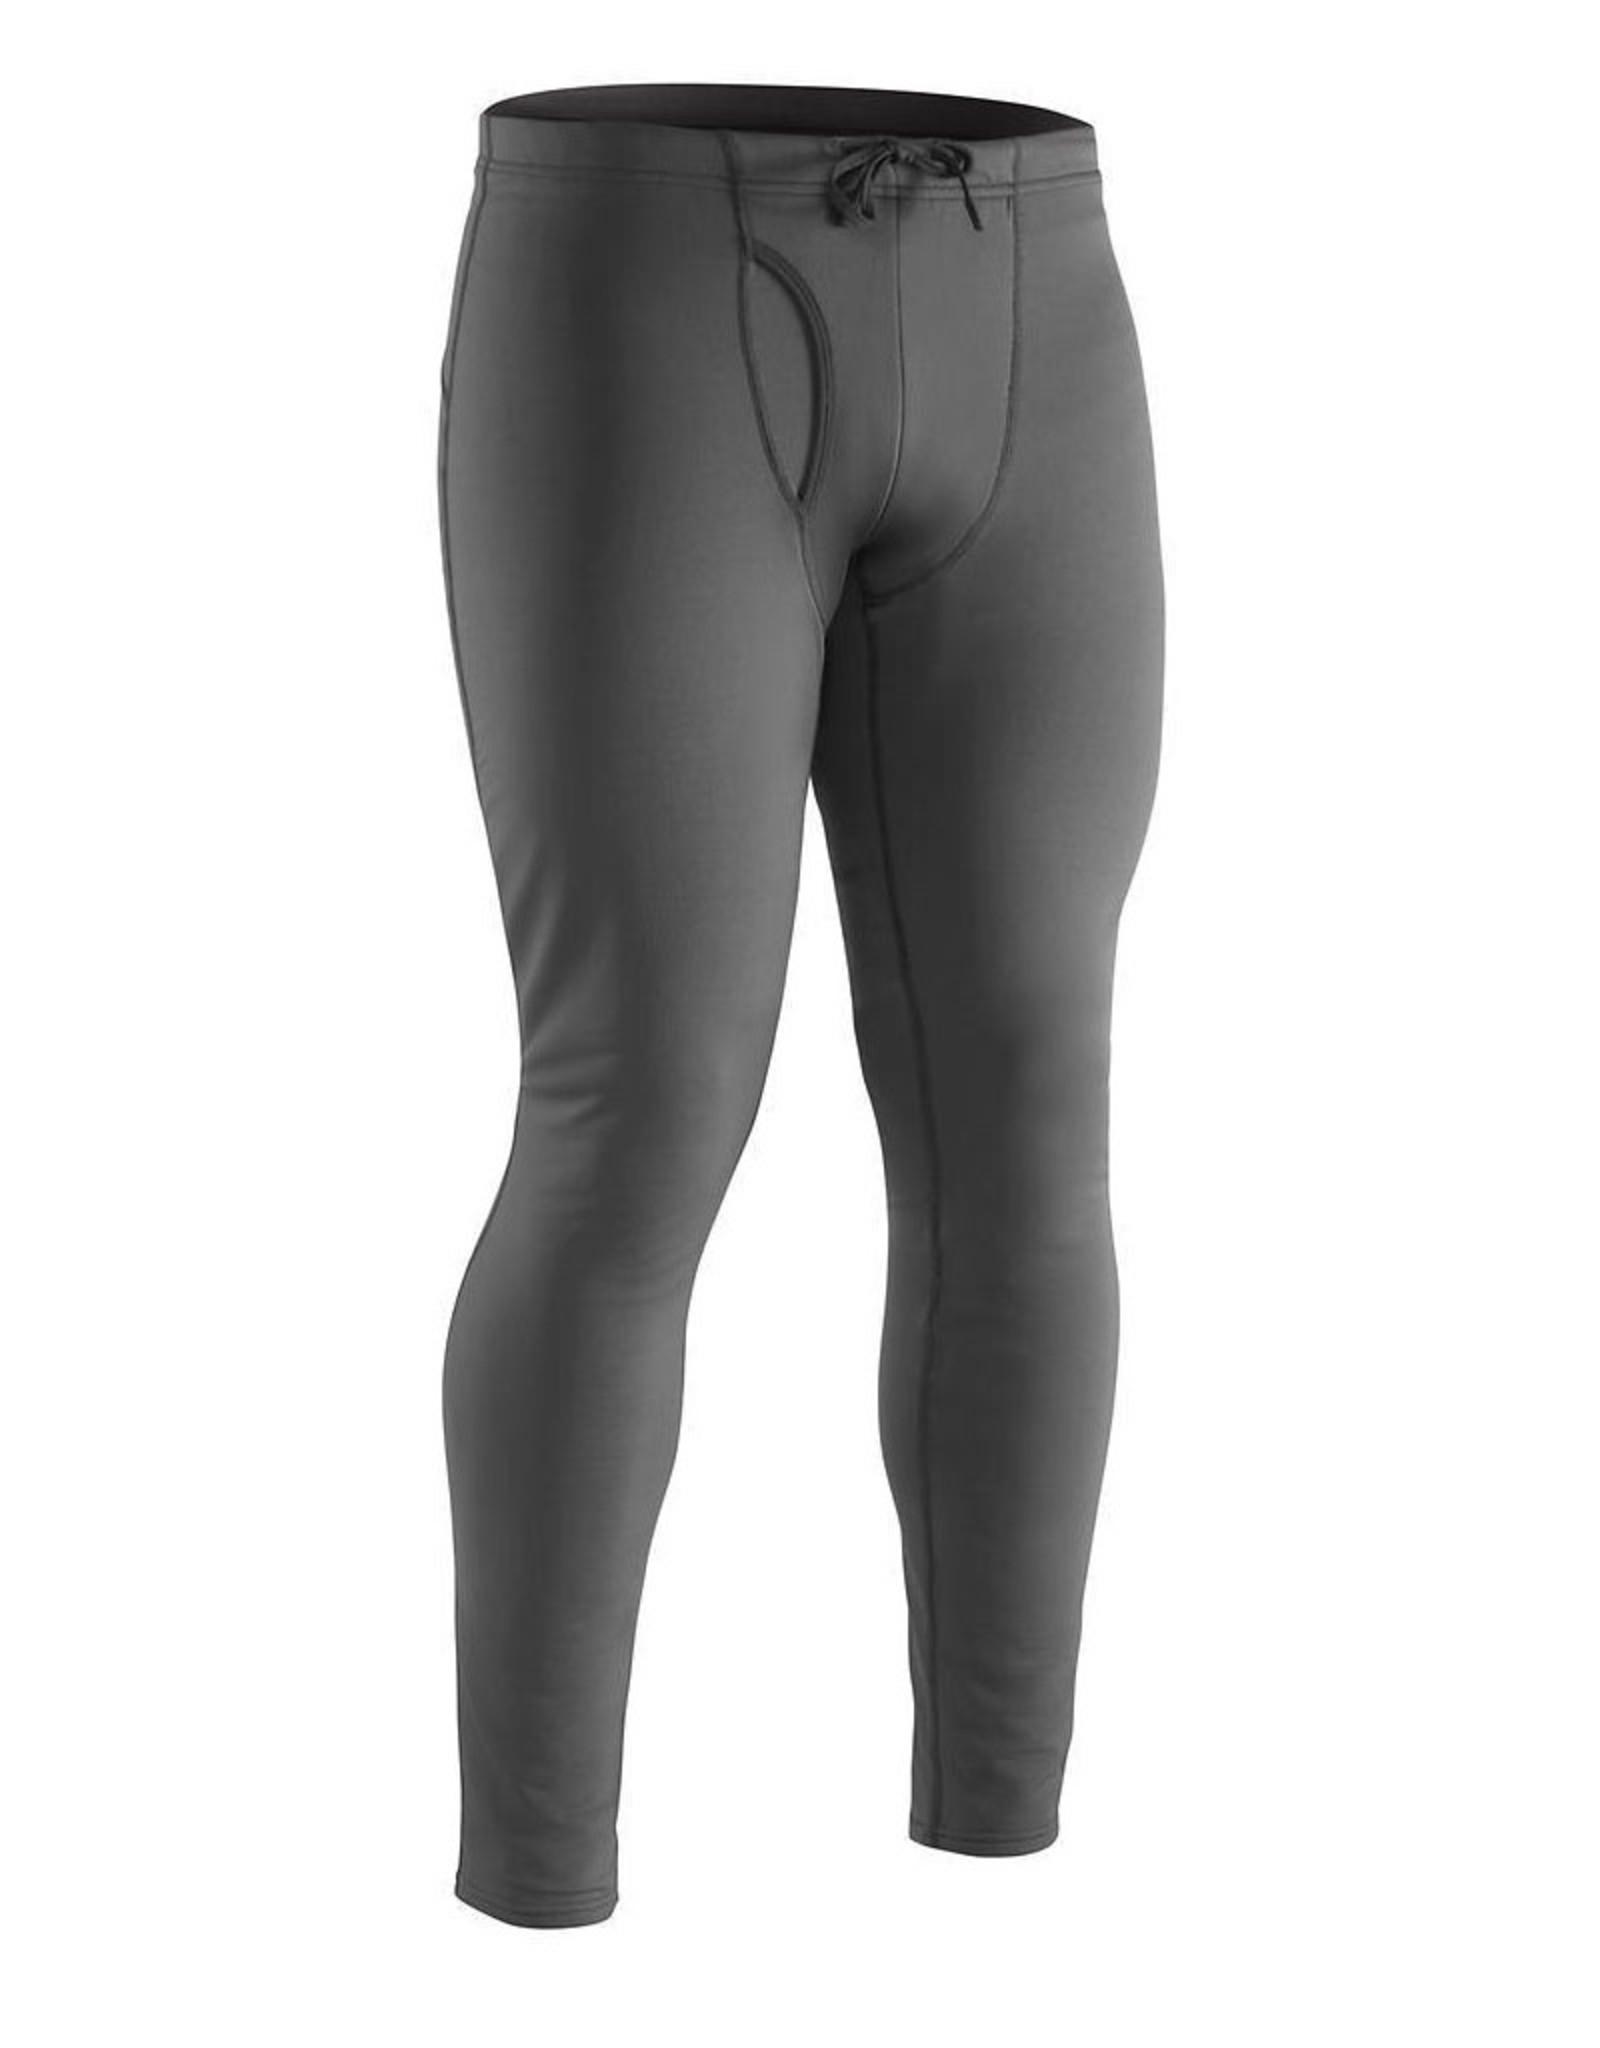 NRS NRS H2Core Lightweight Pants - Men